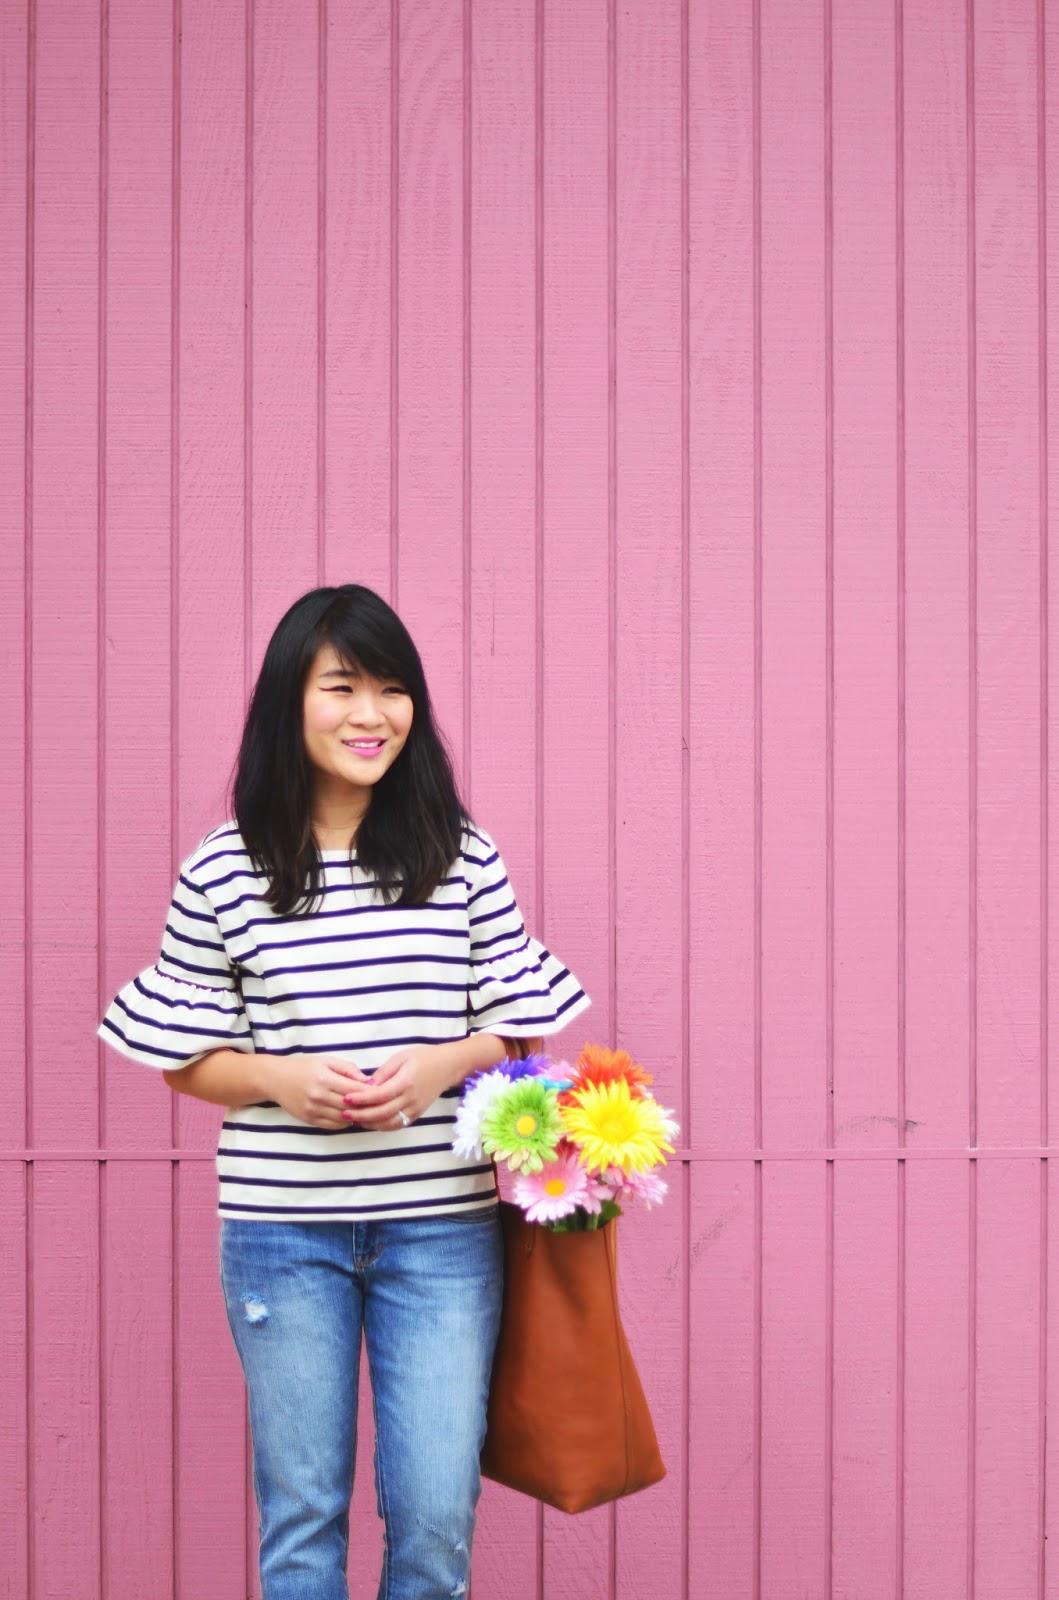 pink wall jcrew stripe bell sleeve shirt madewell transport tote